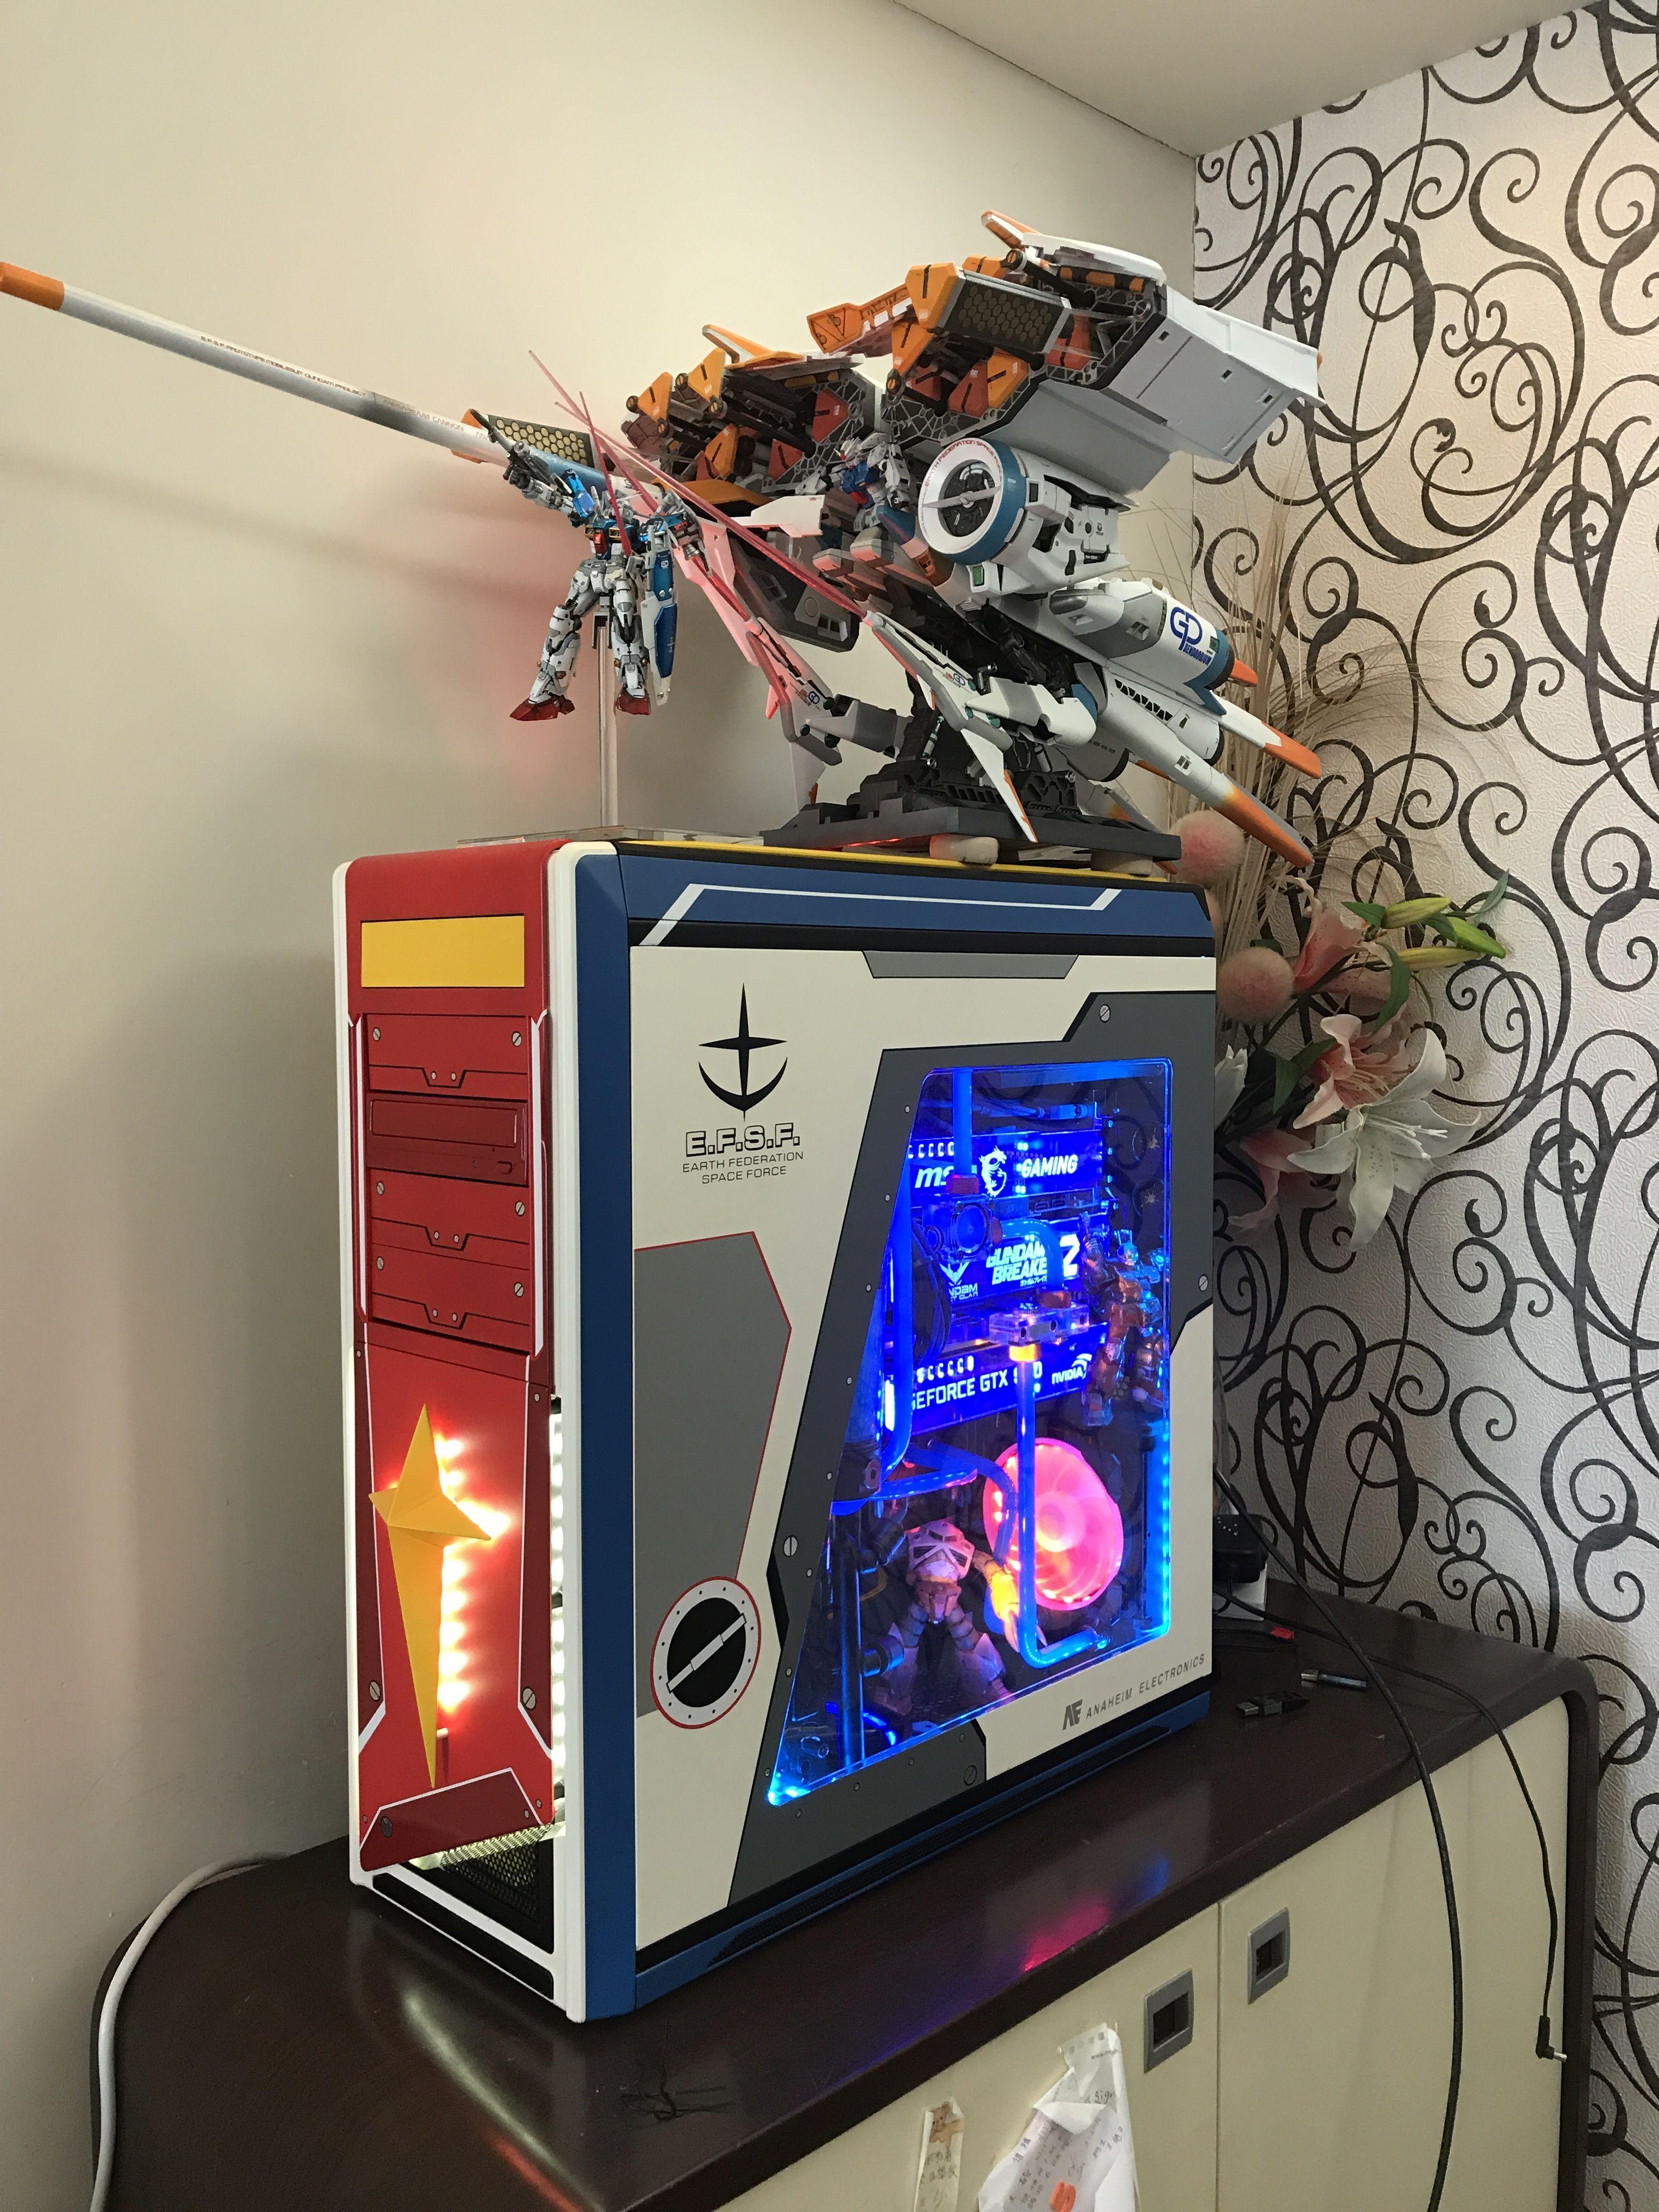 Gundam water cooling RTX PC Gundam, Arcade games